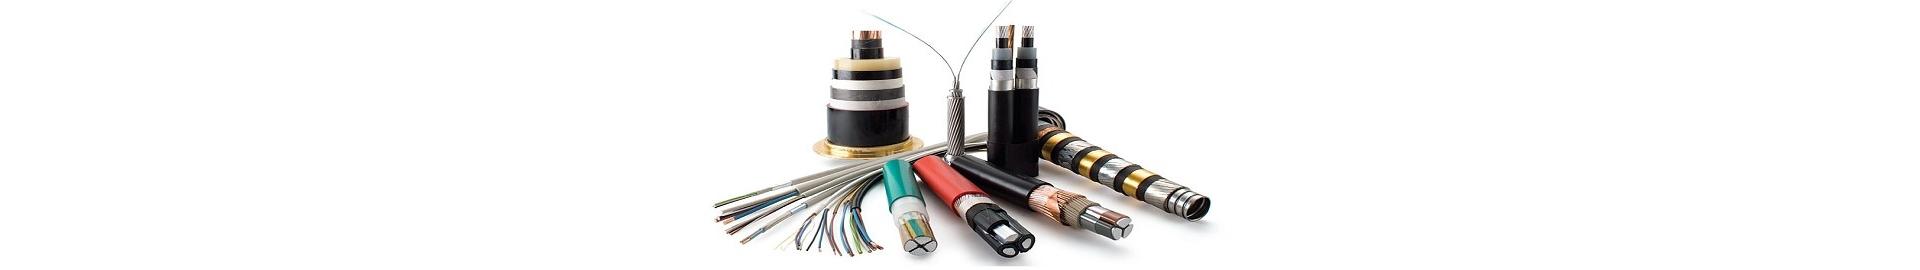 Lampy warsztatowe, latarki, baterie